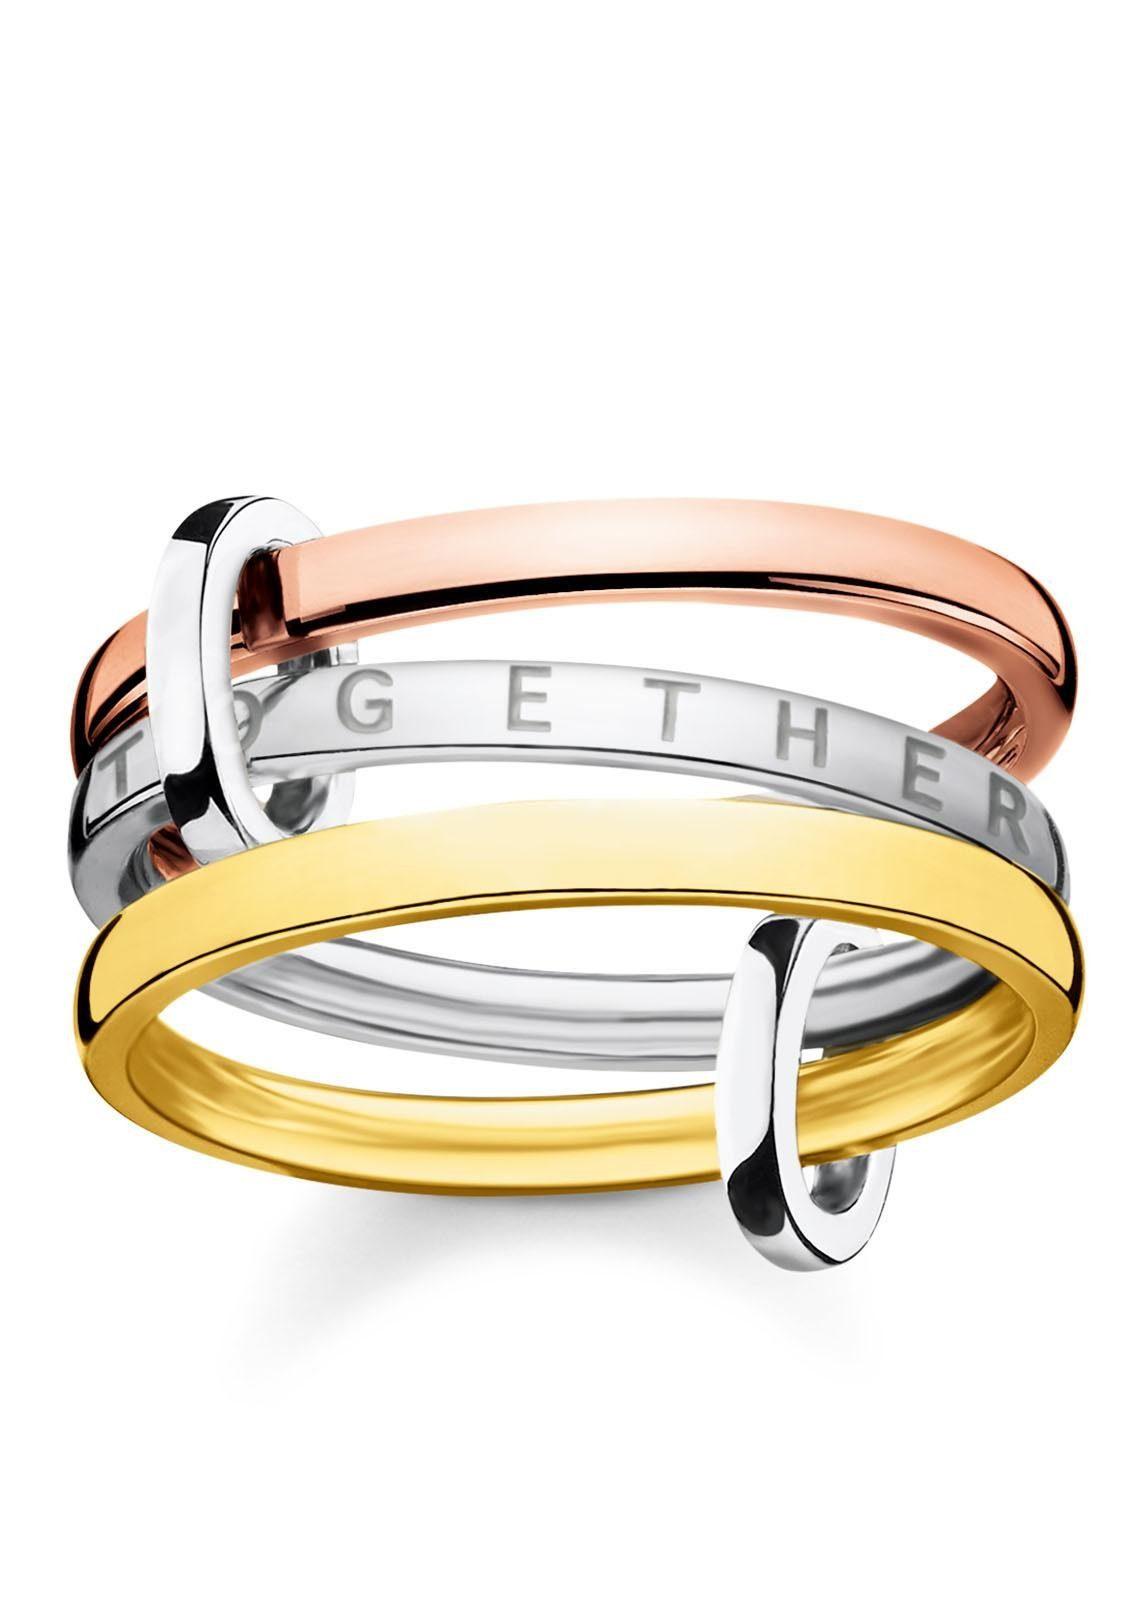 THOMAS SABO Fingerring »Together Forever, D_TR0035-485-7« Online exklusiv bei uns*